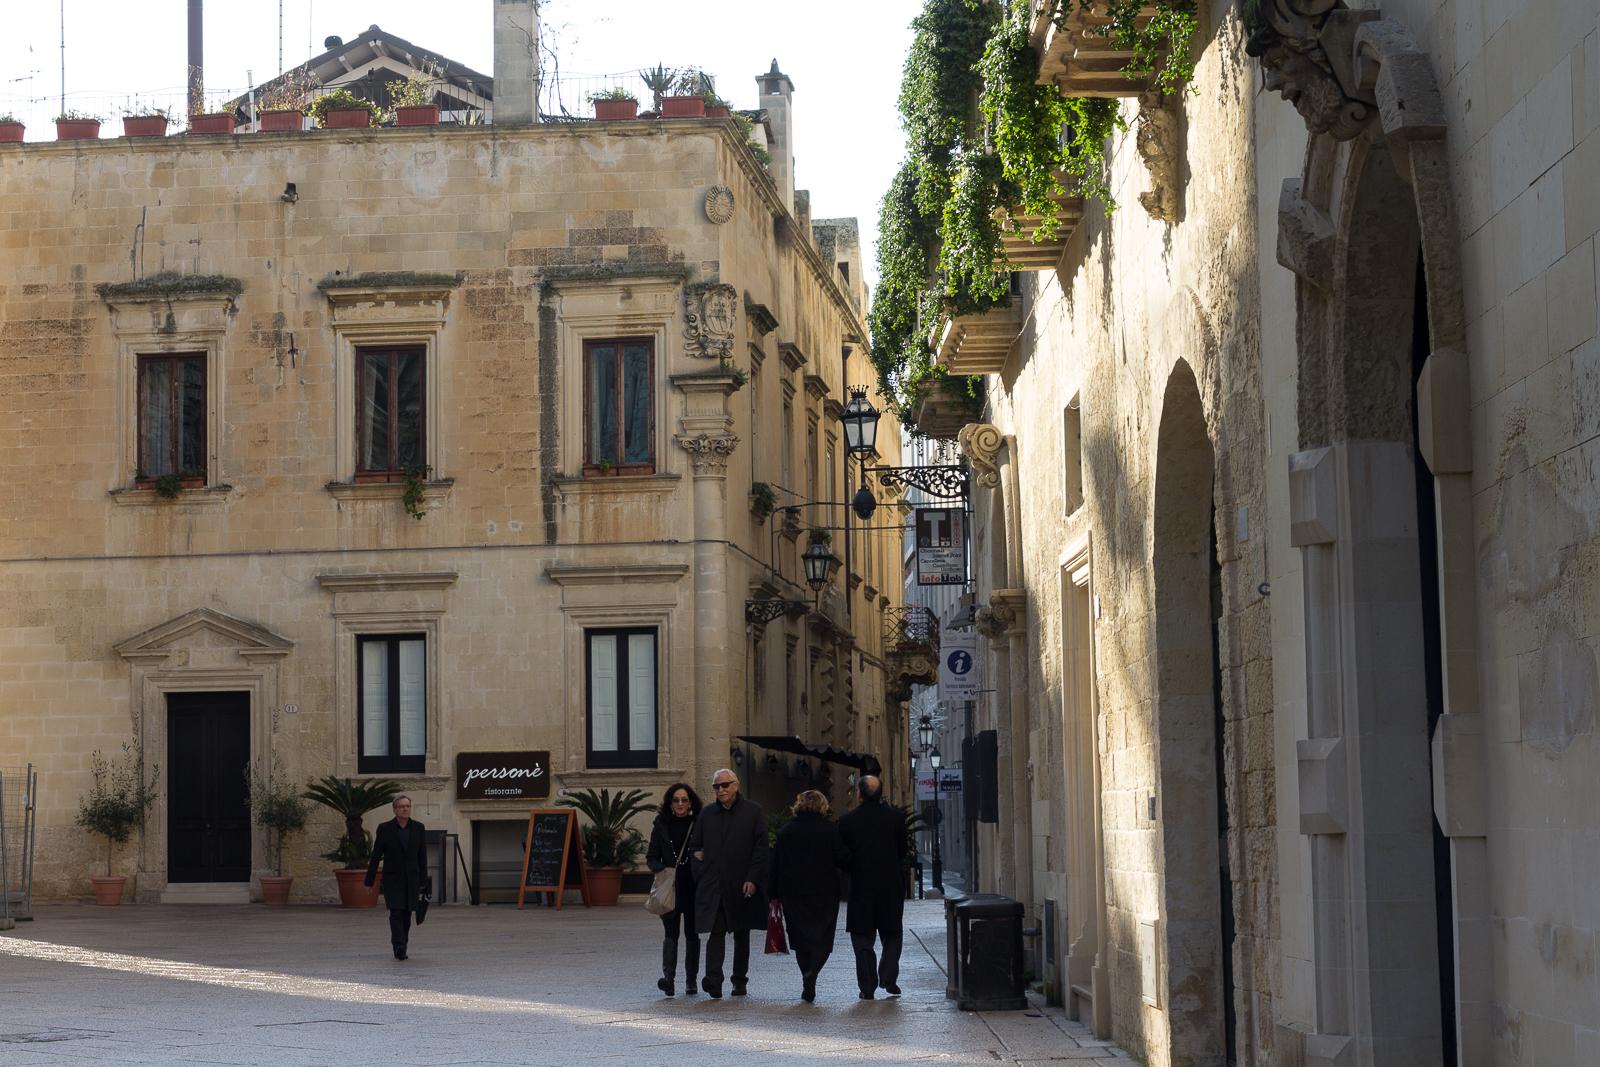 Lecce street view (Via Umberto)